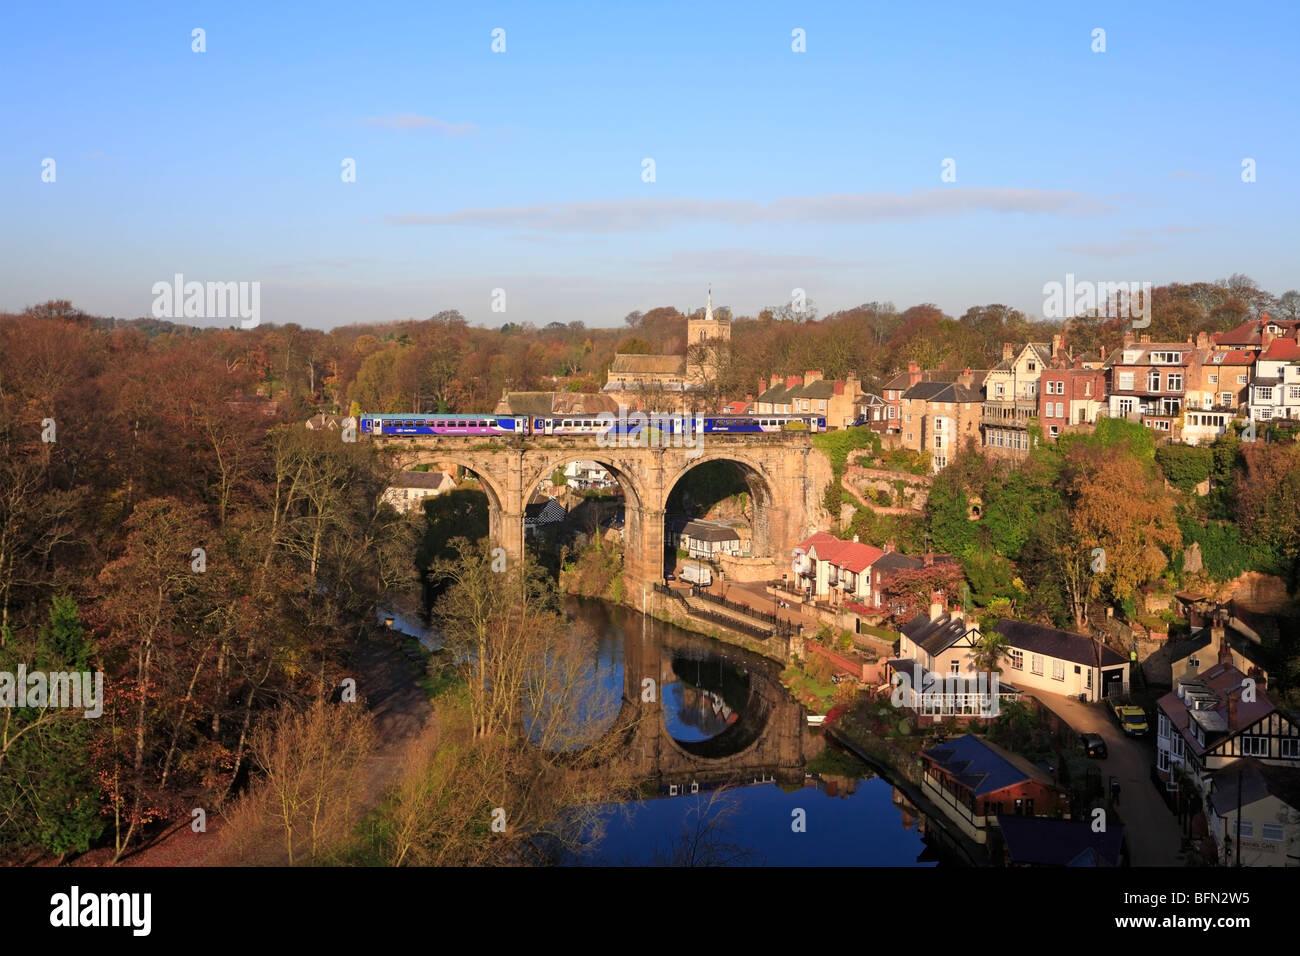 Northern Rail train on the railway viaduct over the River Nidd, Knaresborough, North Yorkshire, England, UK. - Stock Image